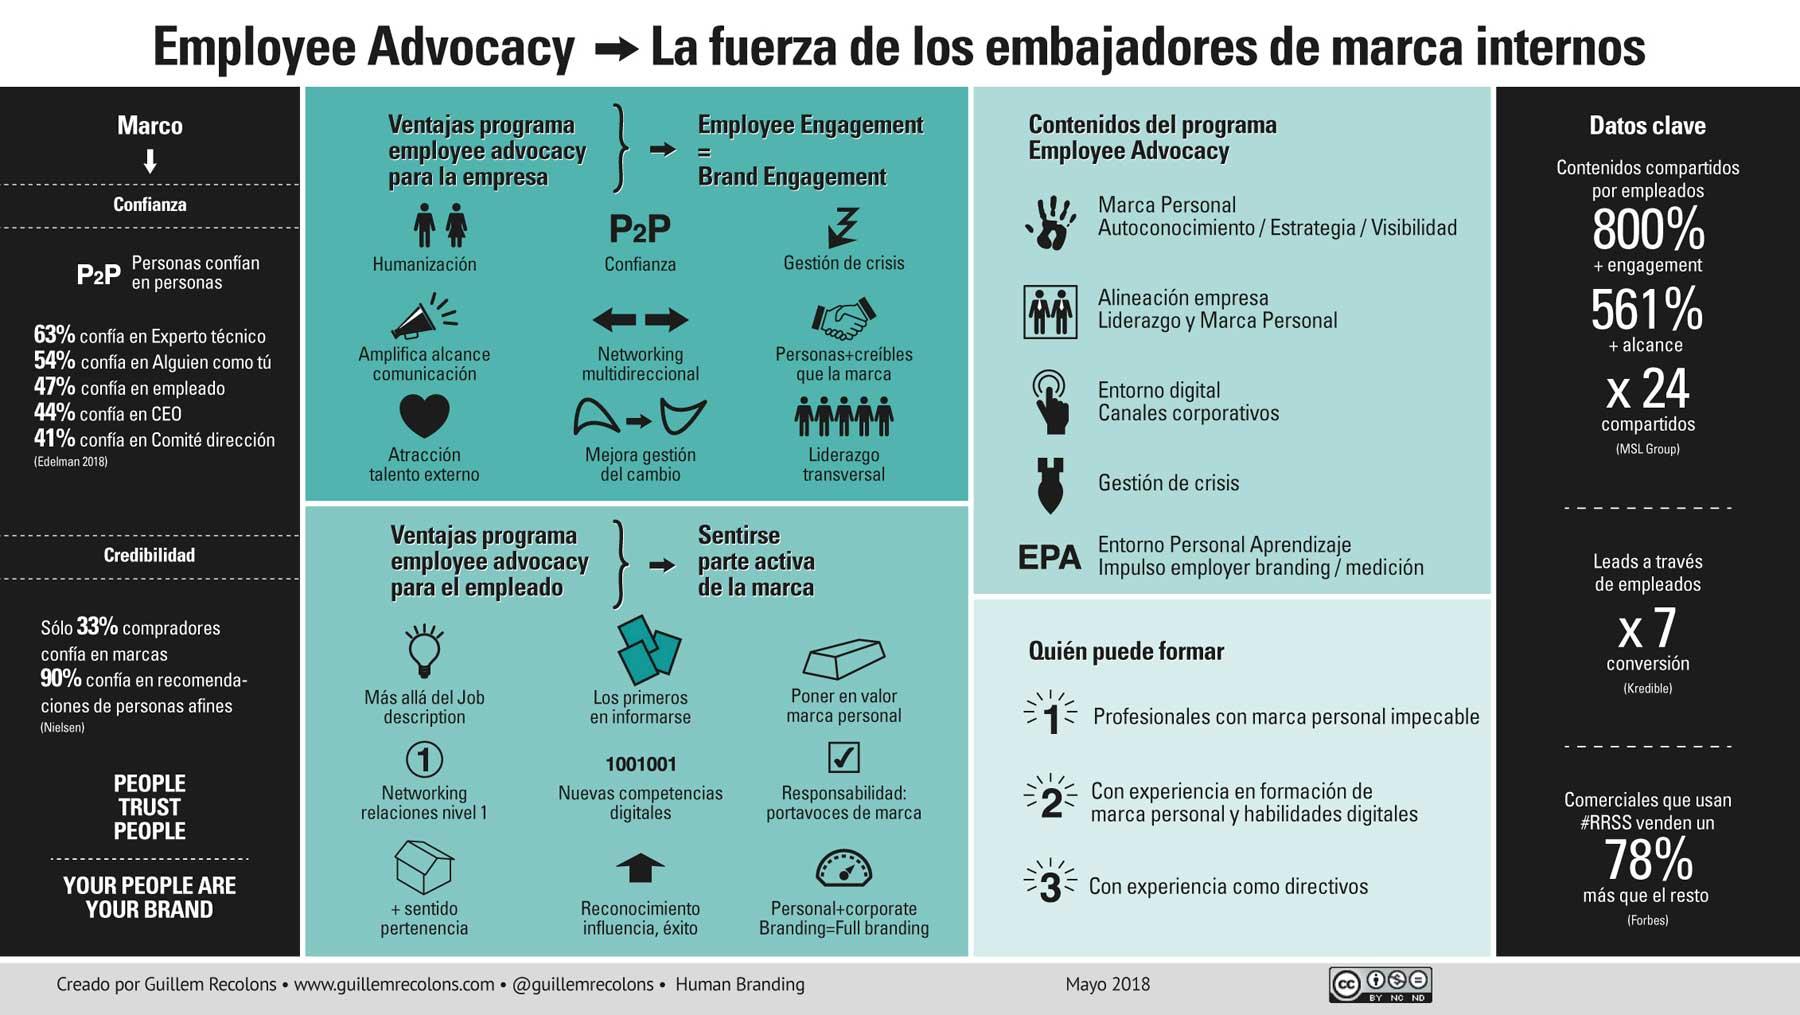 Employee Advocacy, embajadores de marca internos (Guillem Recolons)